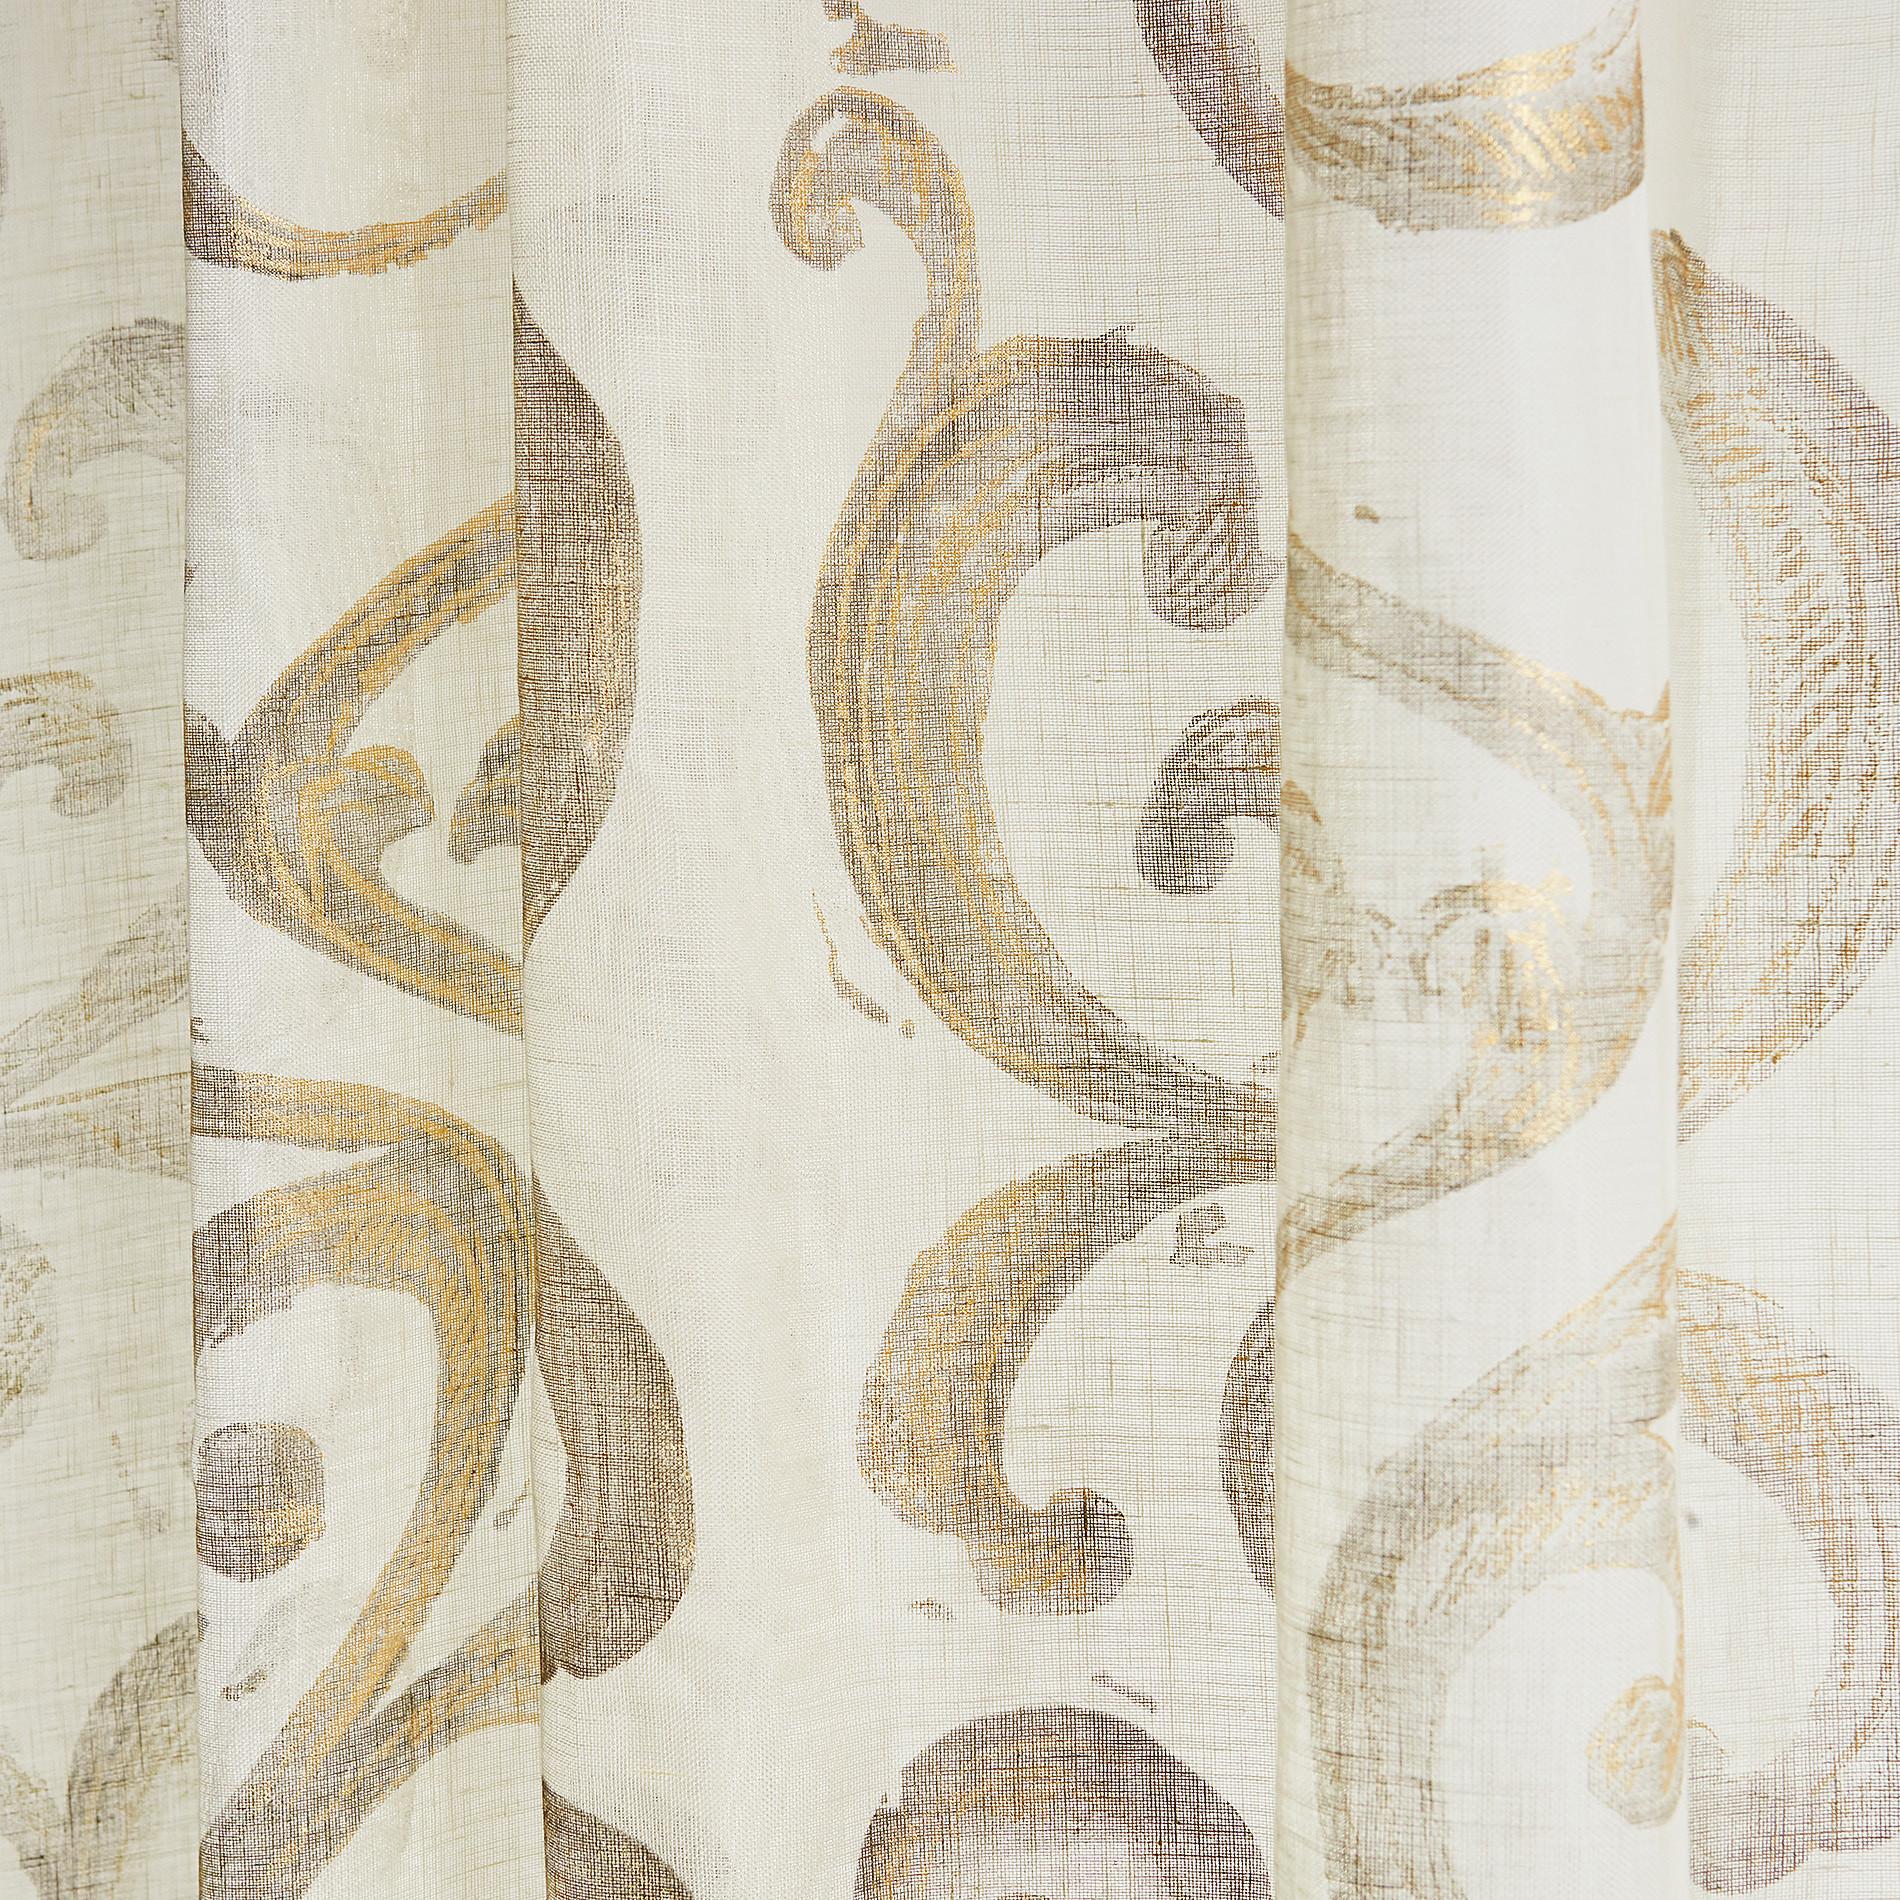 Tenda puro lino stampa devore, Bianco/Oro, large image number 3